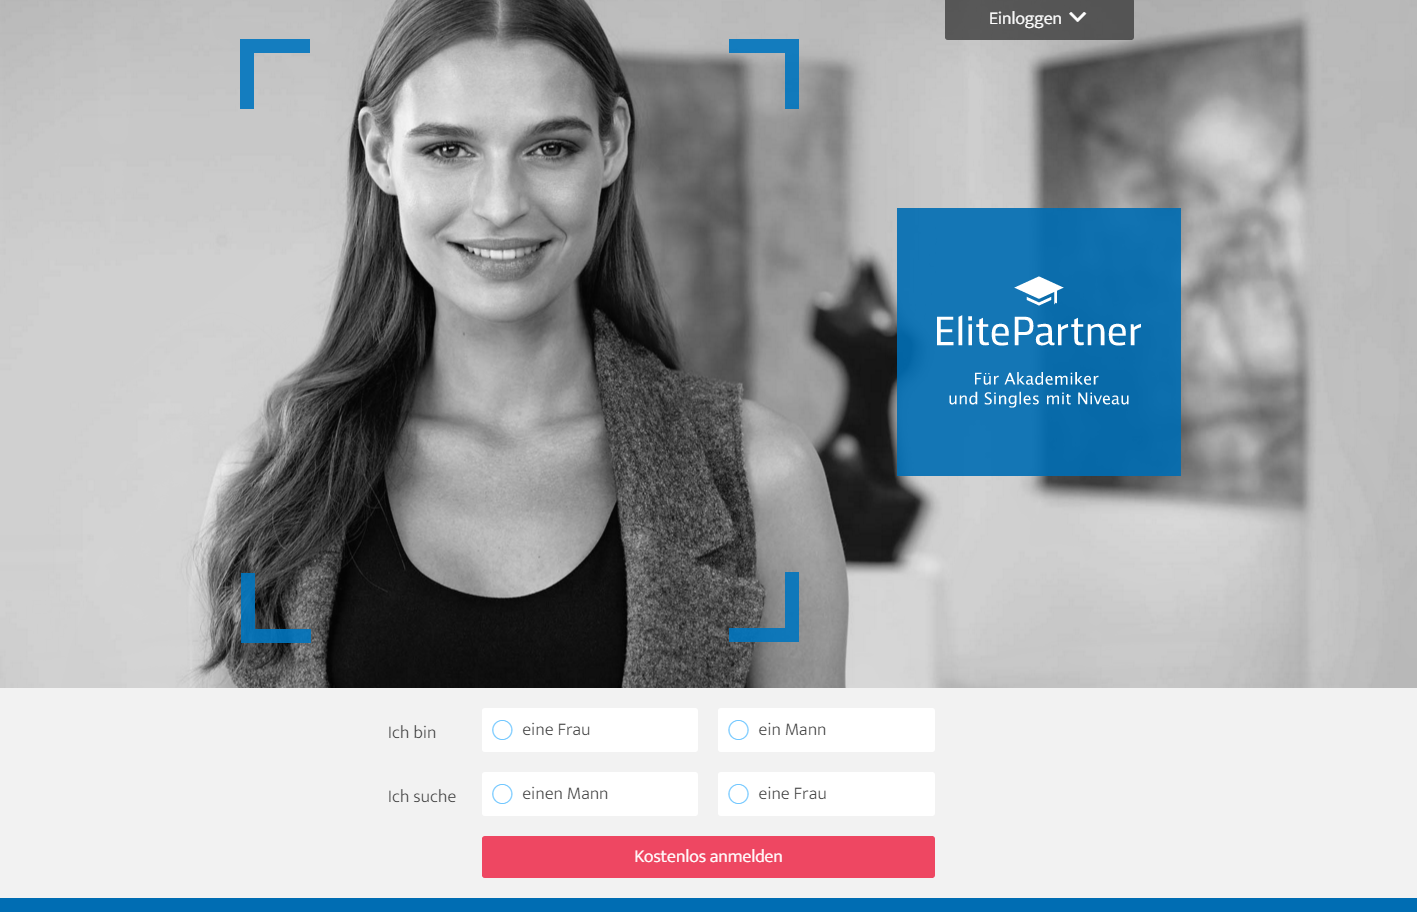 Partnersuche online erfahrung